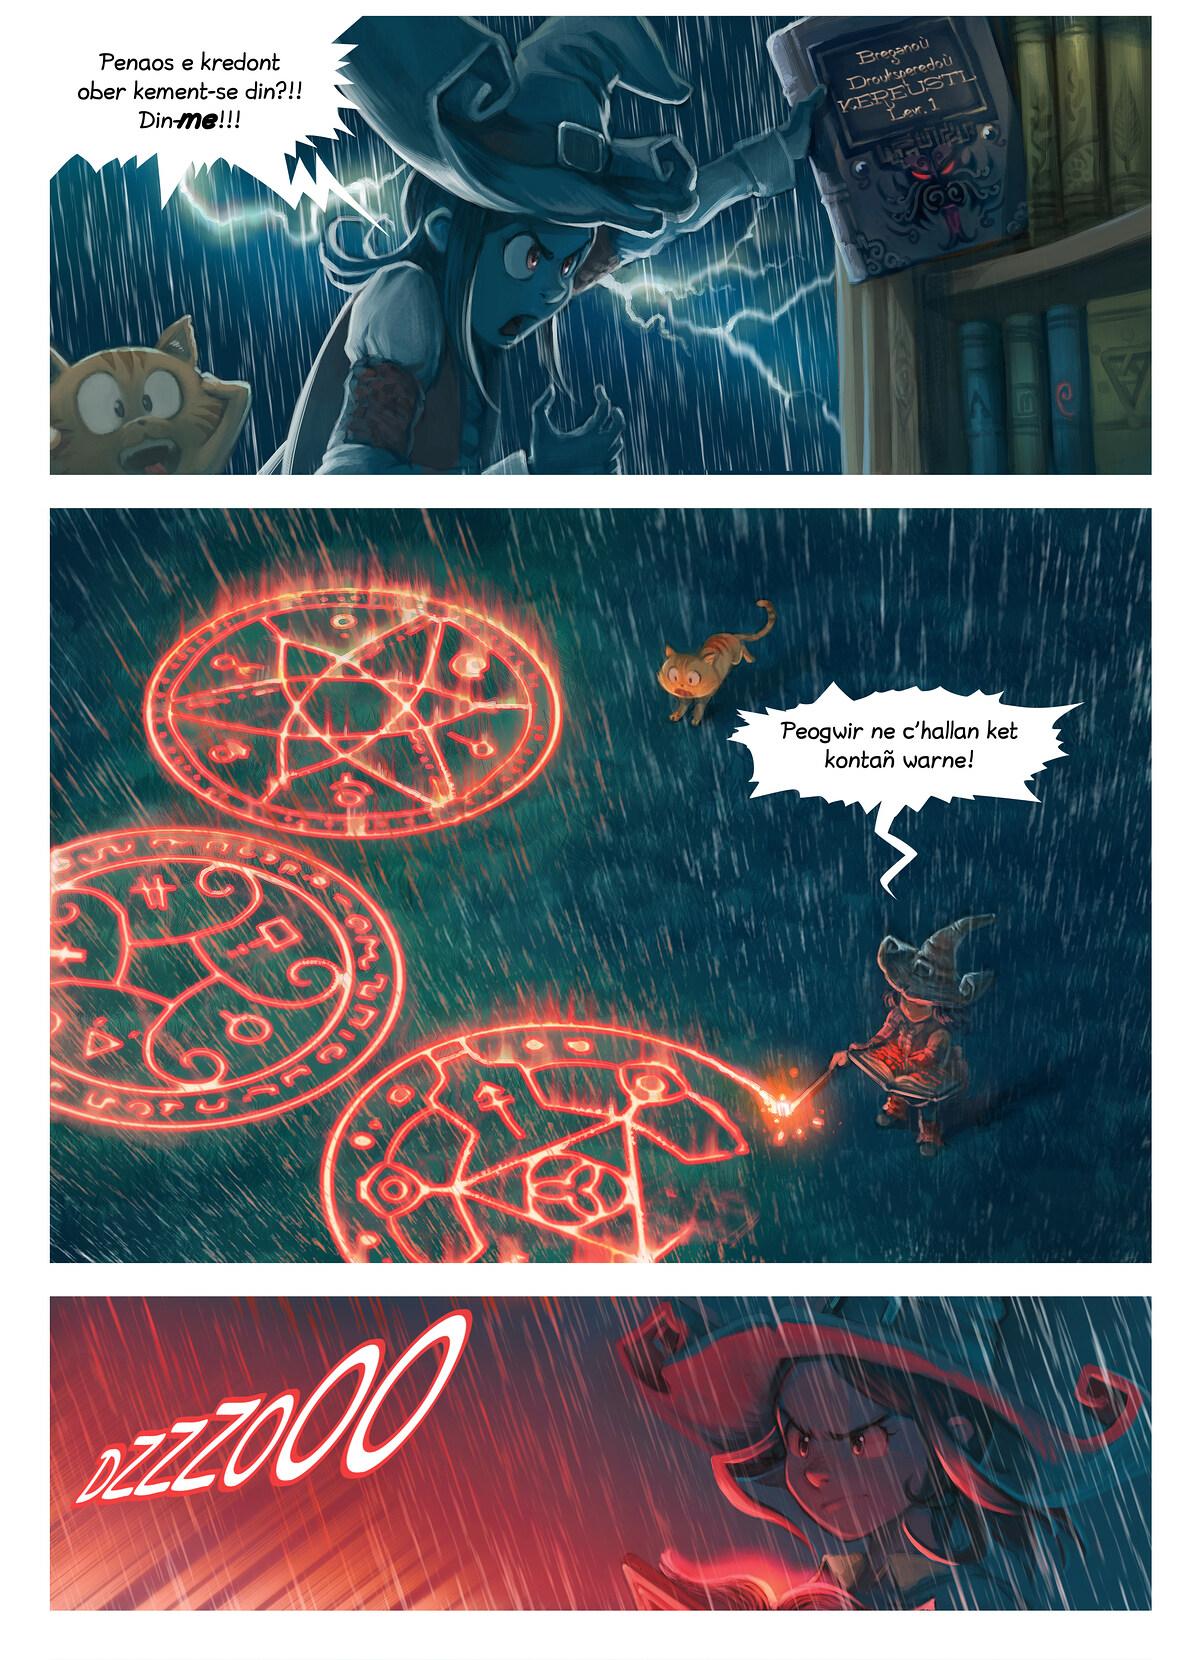 A webcomic page of Pepper&Carrot, rann 8 [br], pajenn 5